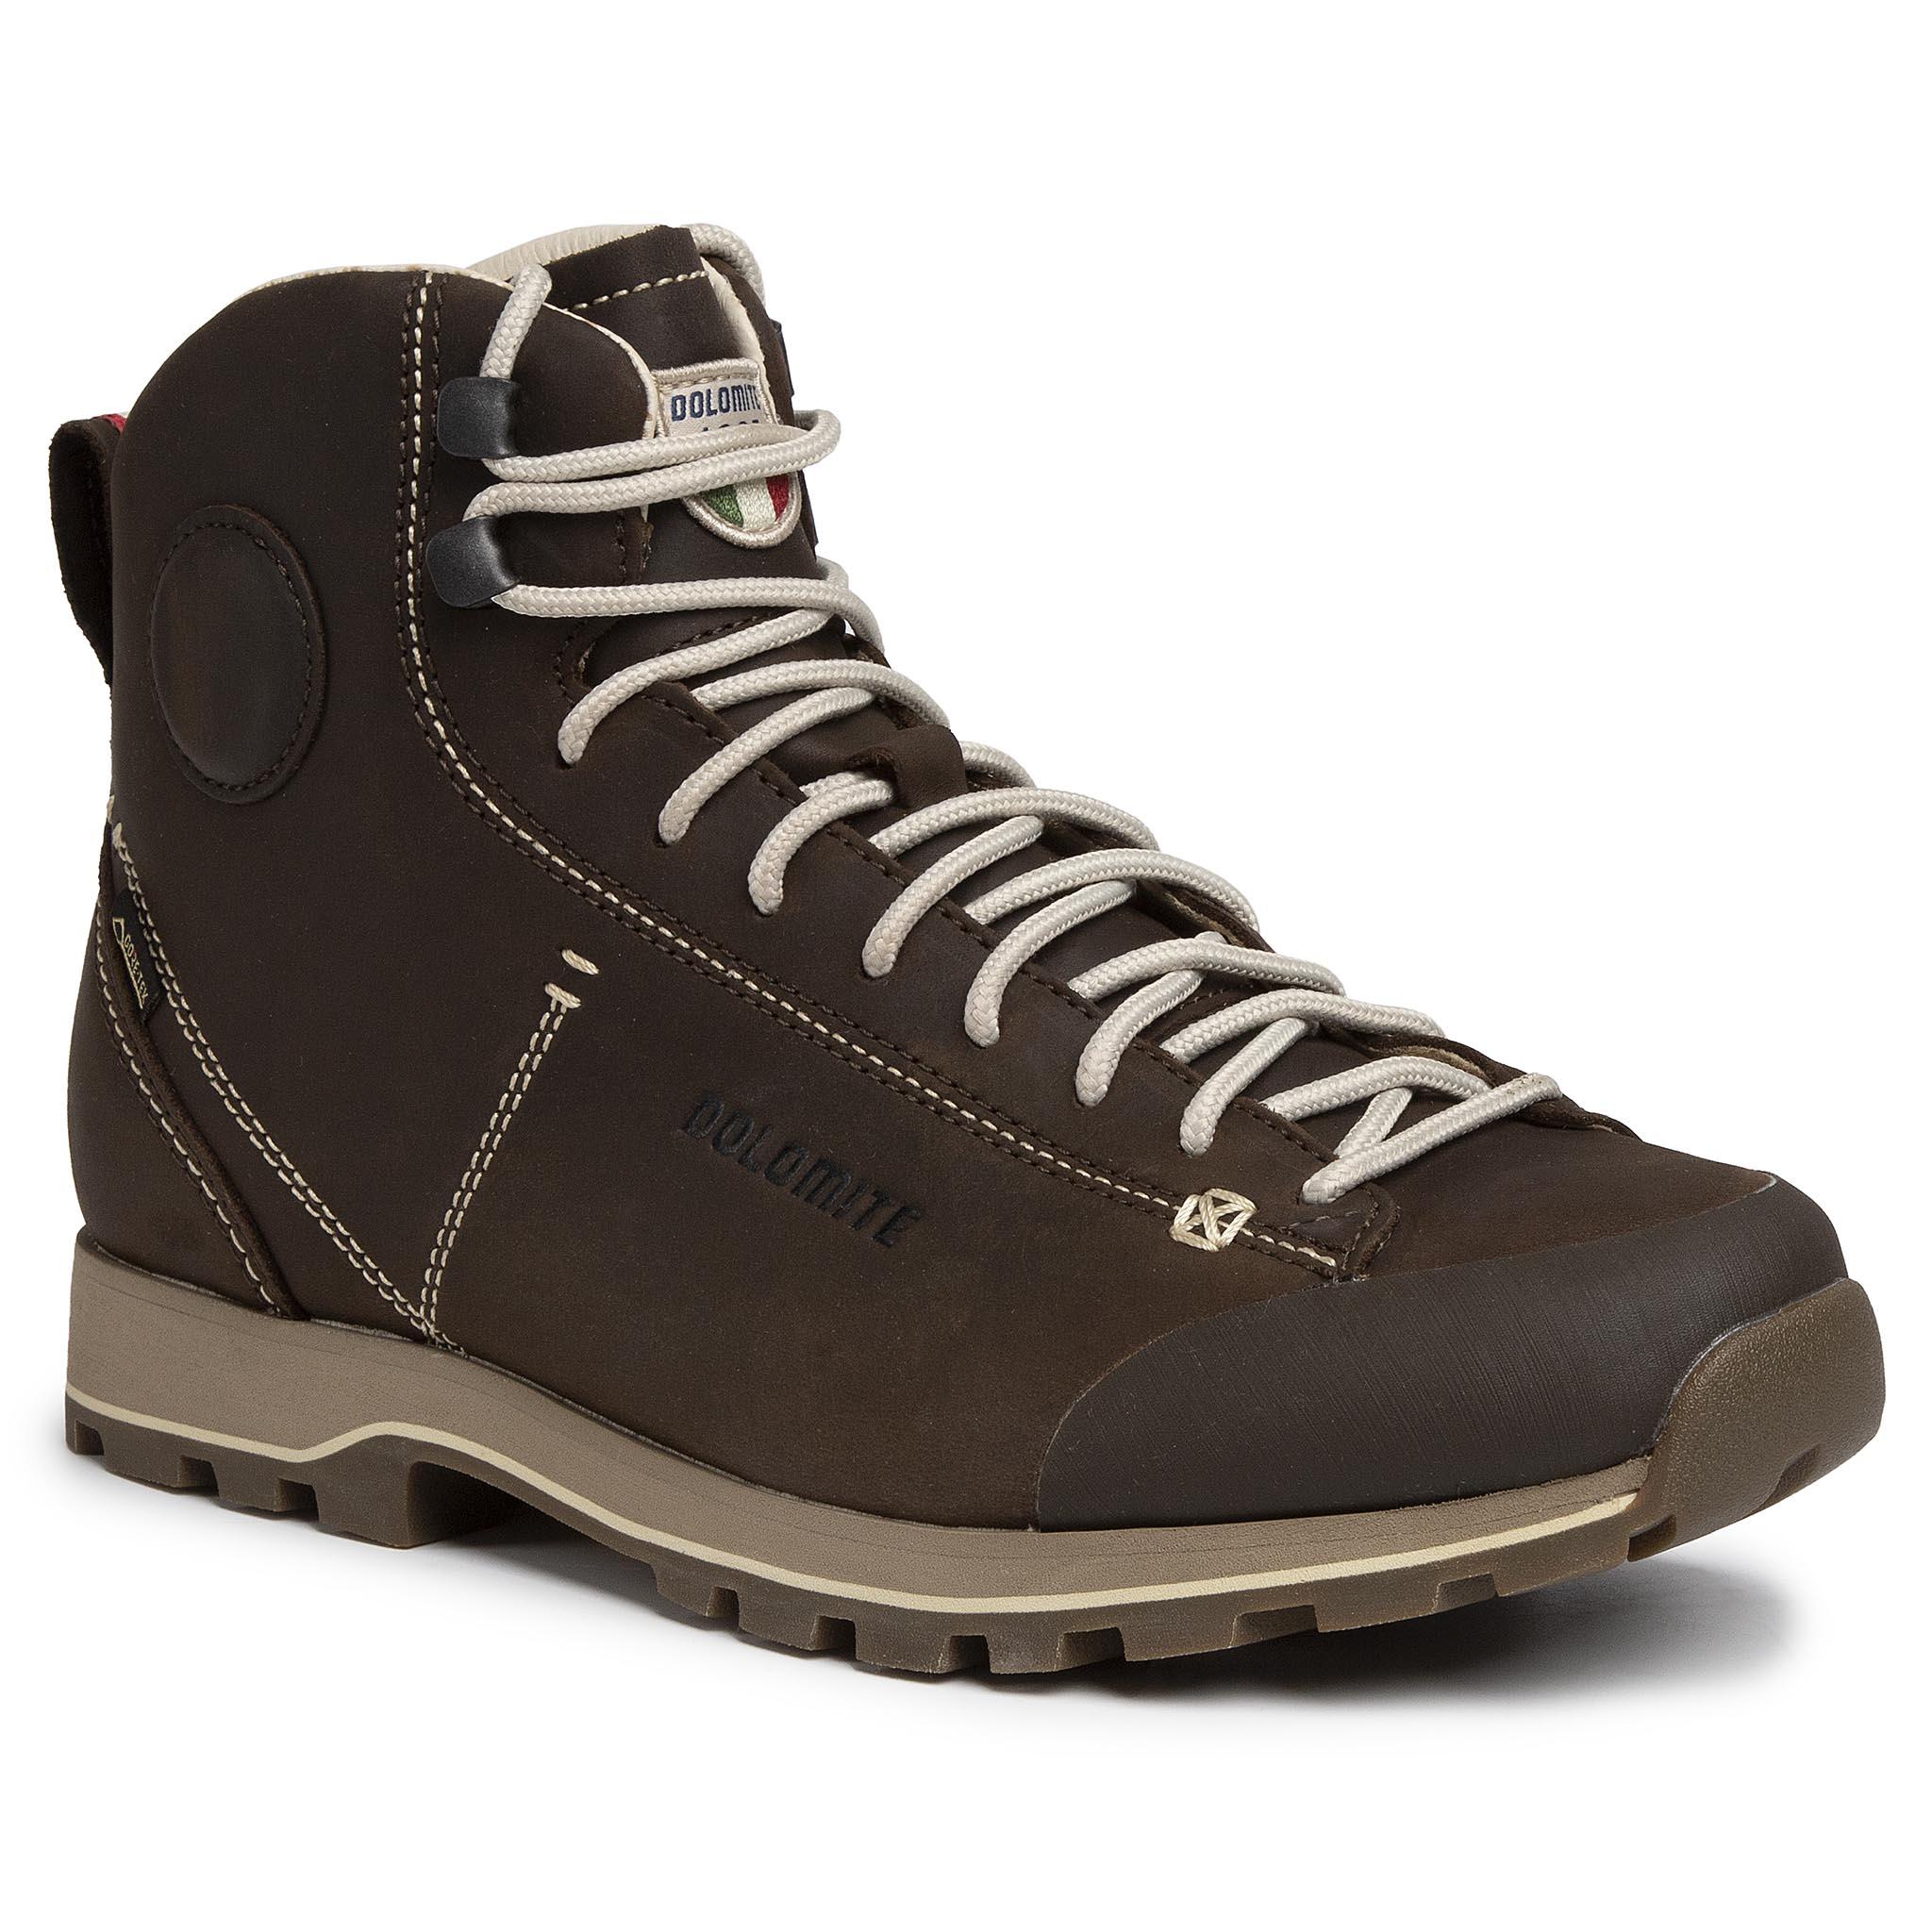 Trekker Boots DOLOMITE Cinquantaquattro High Fg Gtx GORE